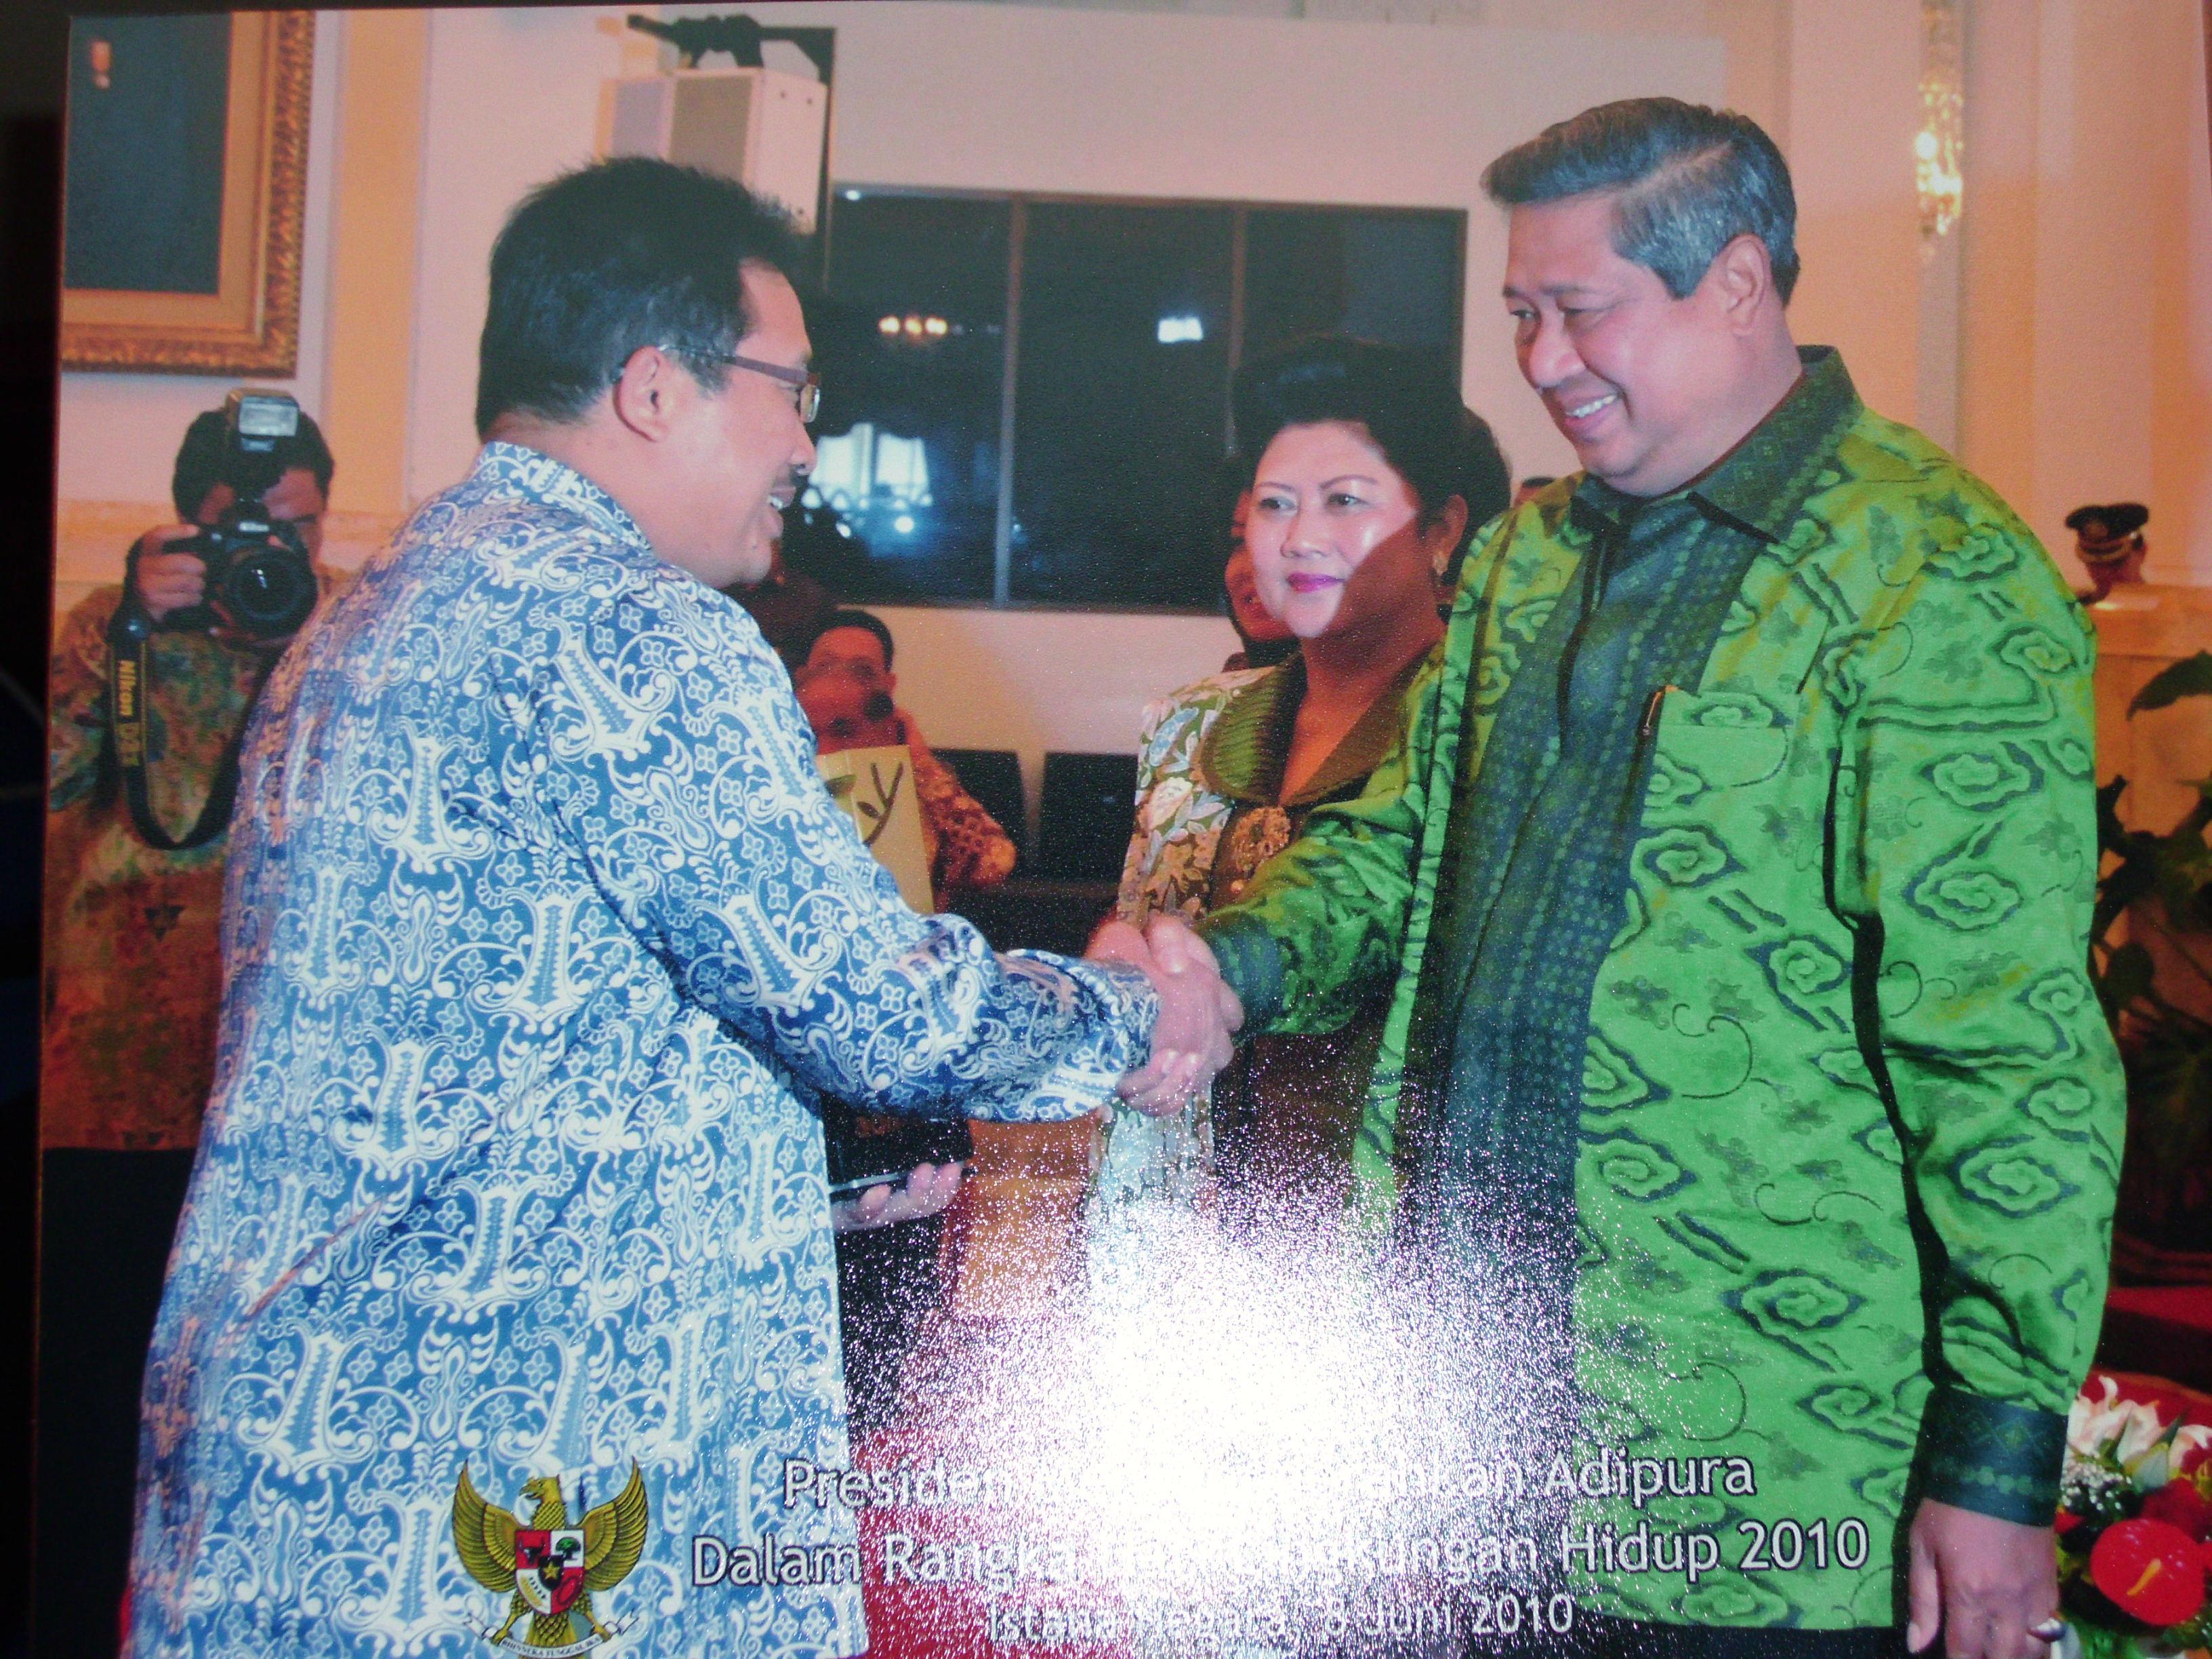 Penerimaan Penghargaan Adipura oleh<BR>Presiden Susilo Bambang Yudhoyono